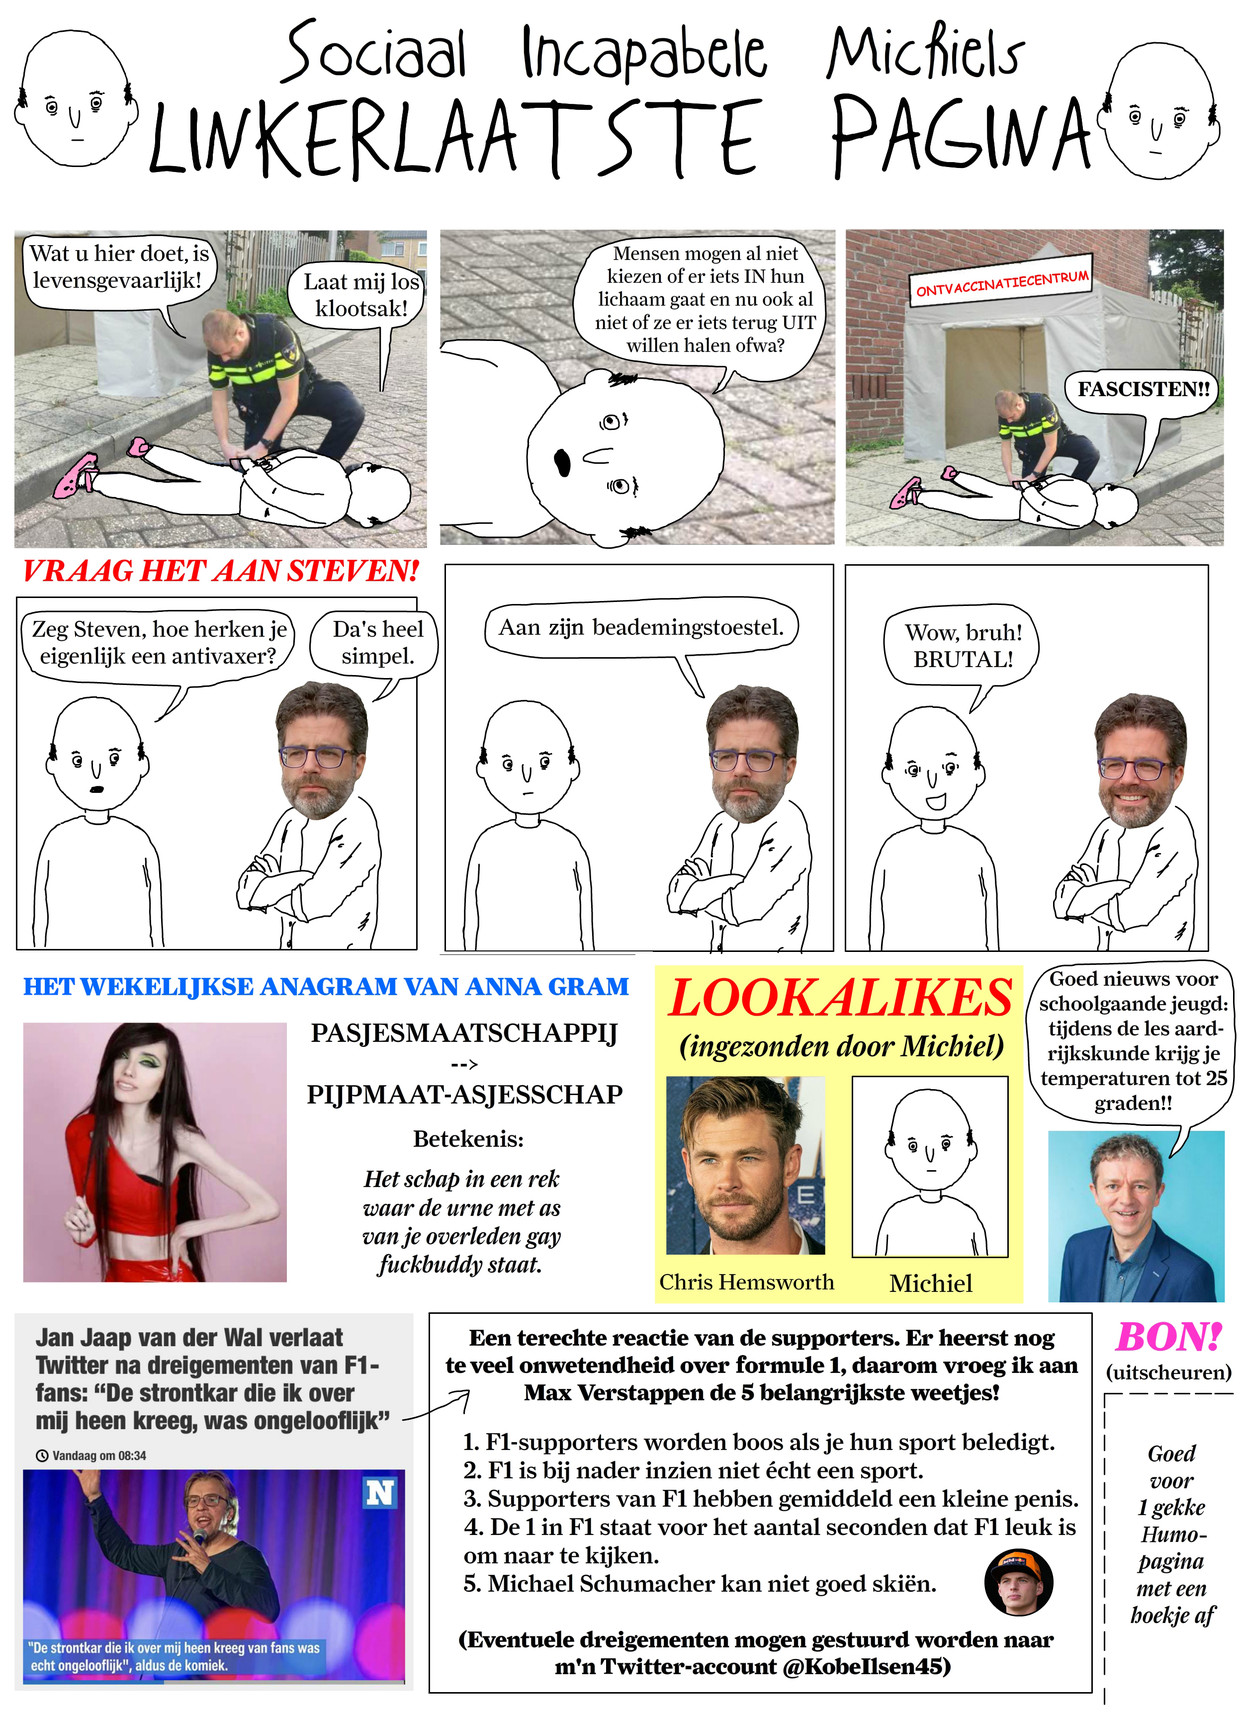 Sociaal Incapabele Michiel 36 Beeld Tom Borremans | Humo